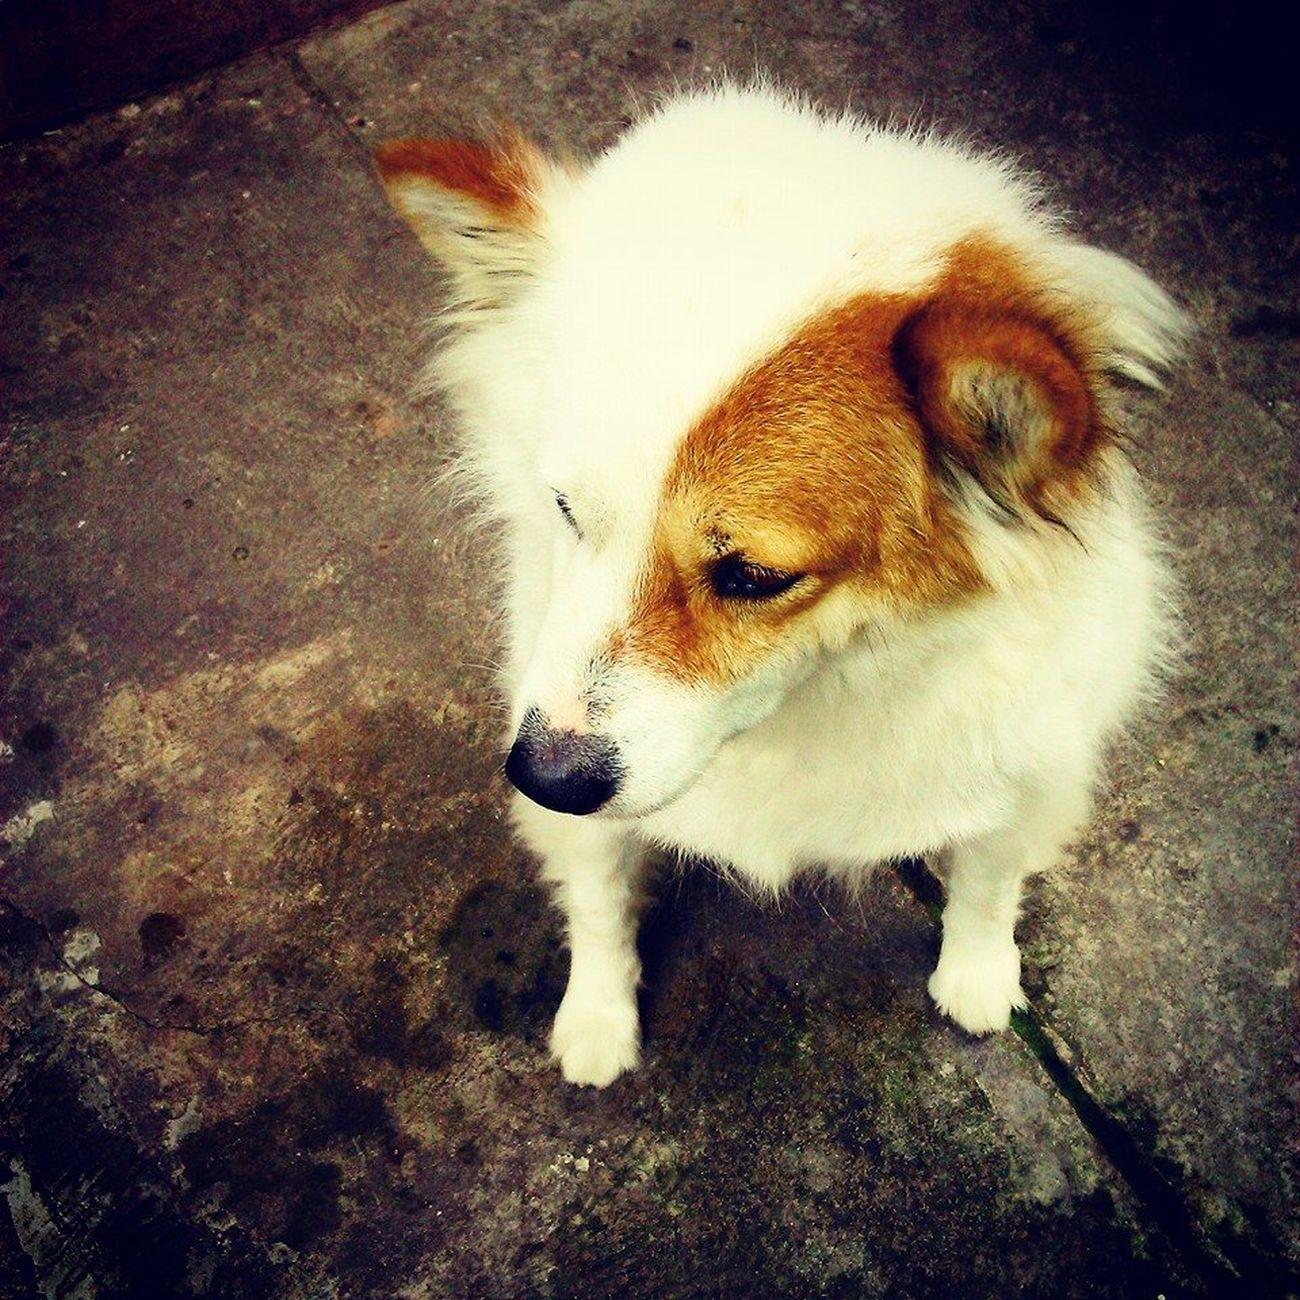 Taking Photos Lovely Kin Love♥ Dog Cute Dalat Cute♡ Cute Pets Cute Dog